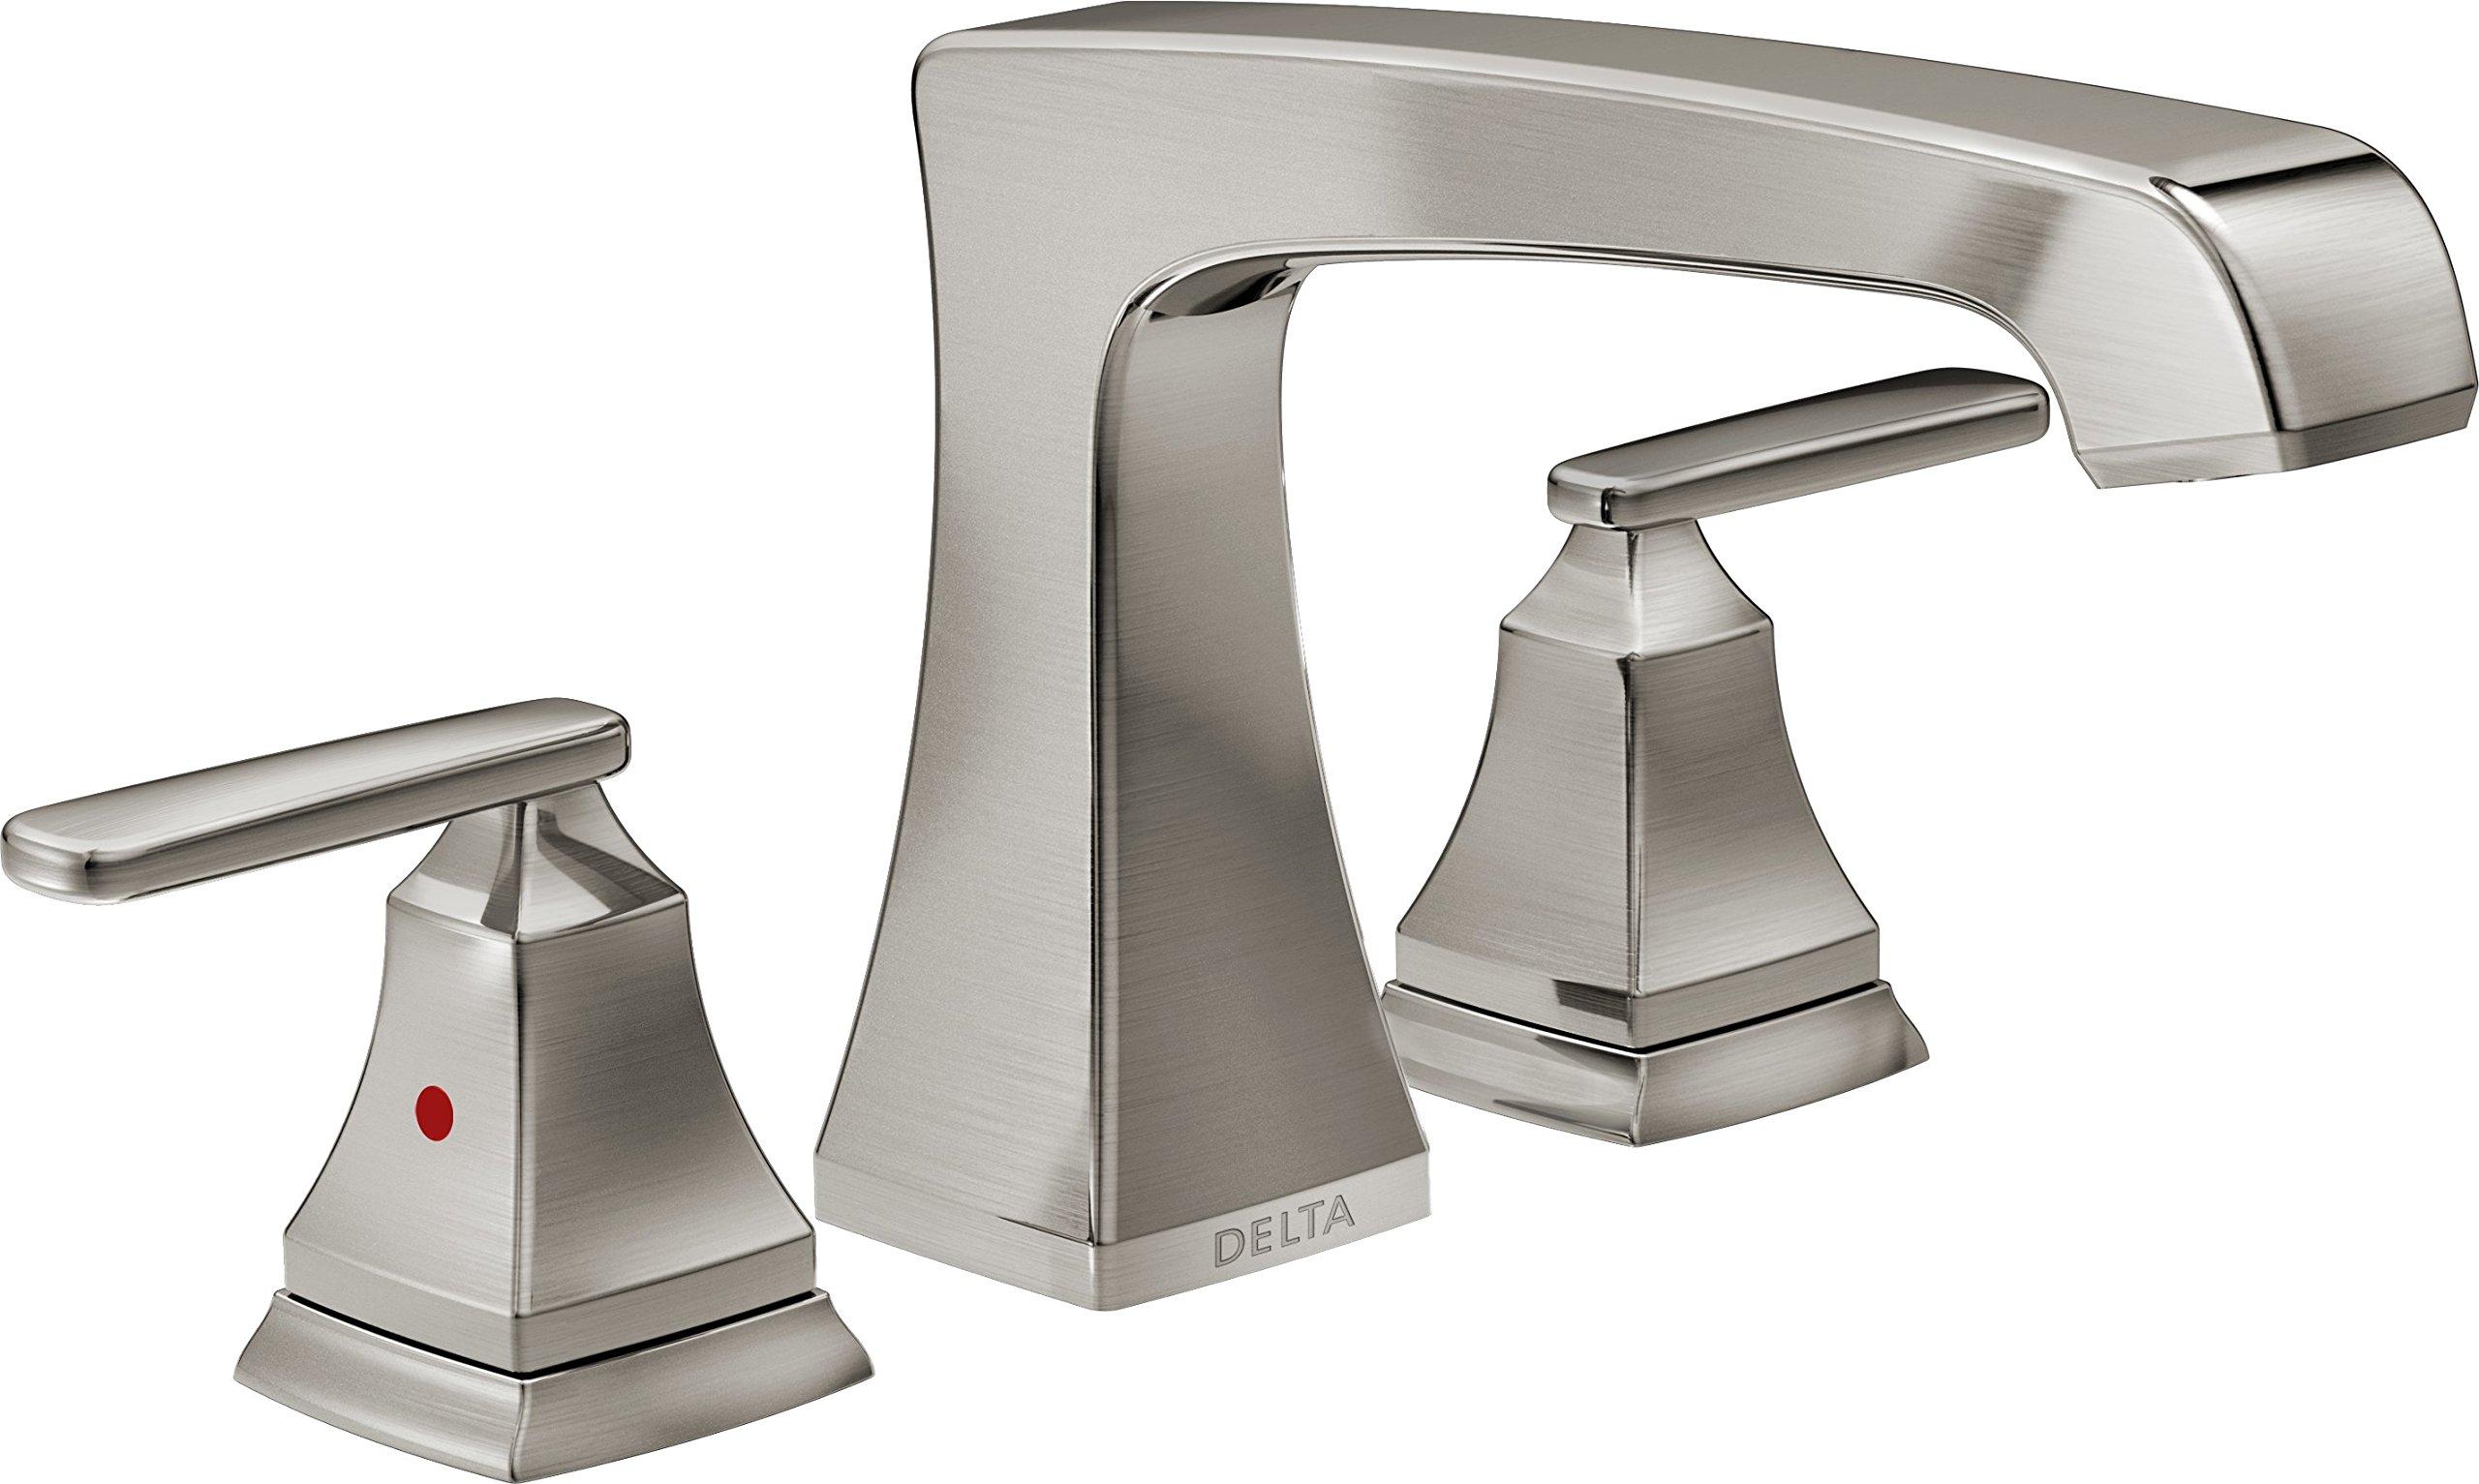 Cheap Delta Roman Tub Faucet, find Delta Roman Tub Faucet deals on ...